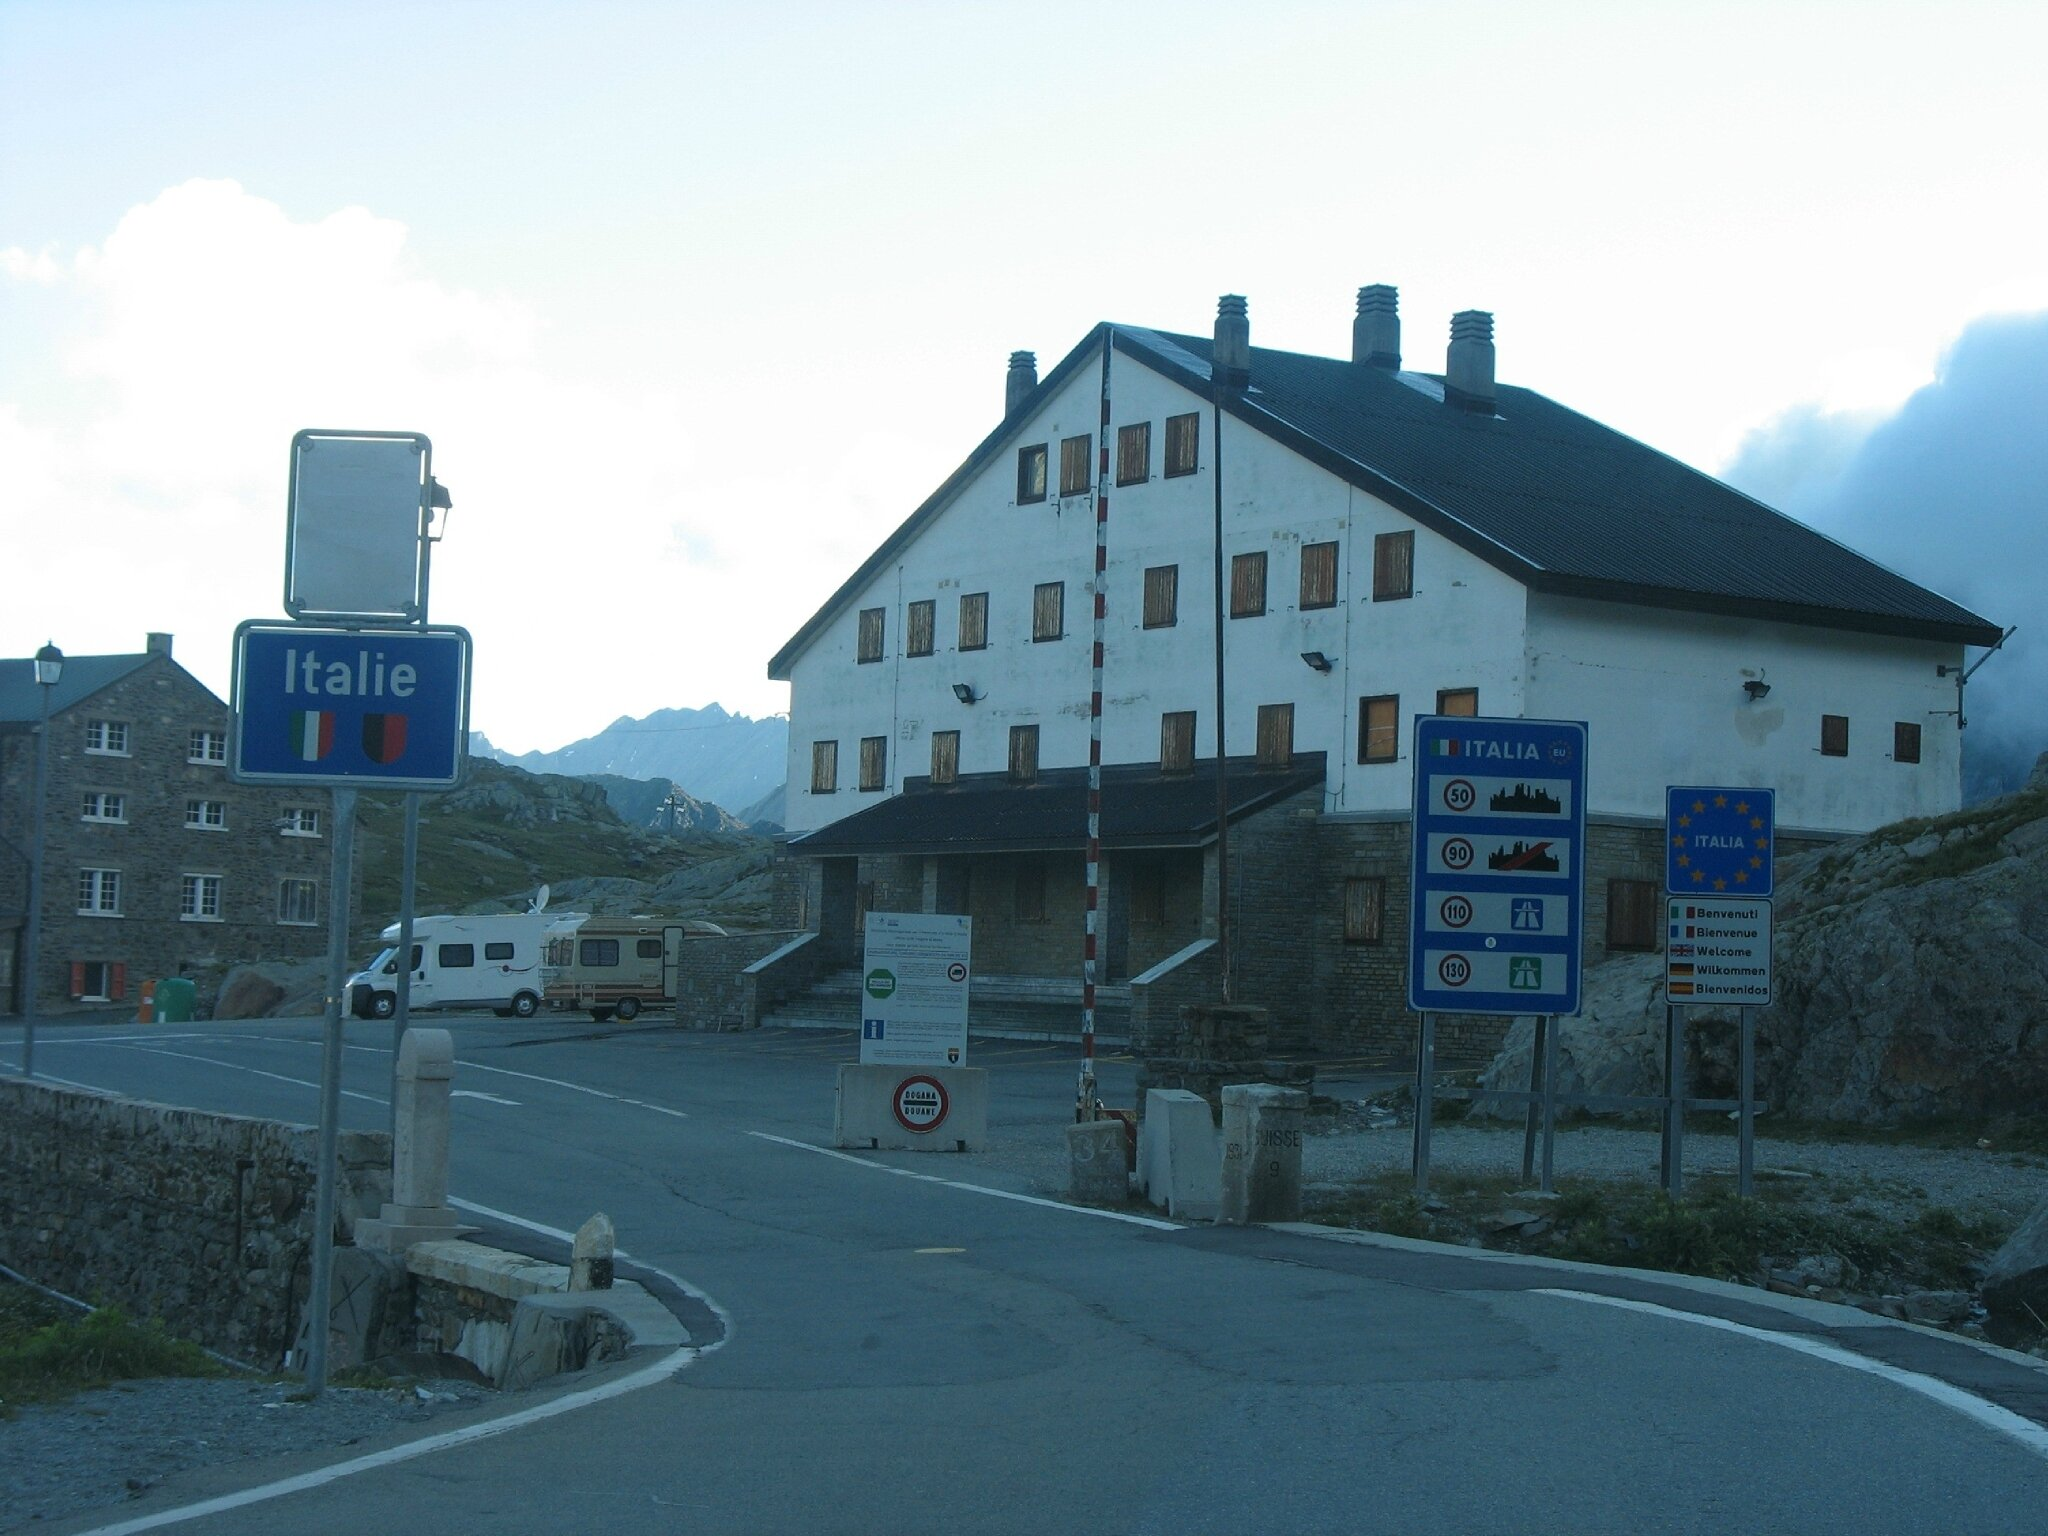 Col du Grand Saint-Bernard (Italie)